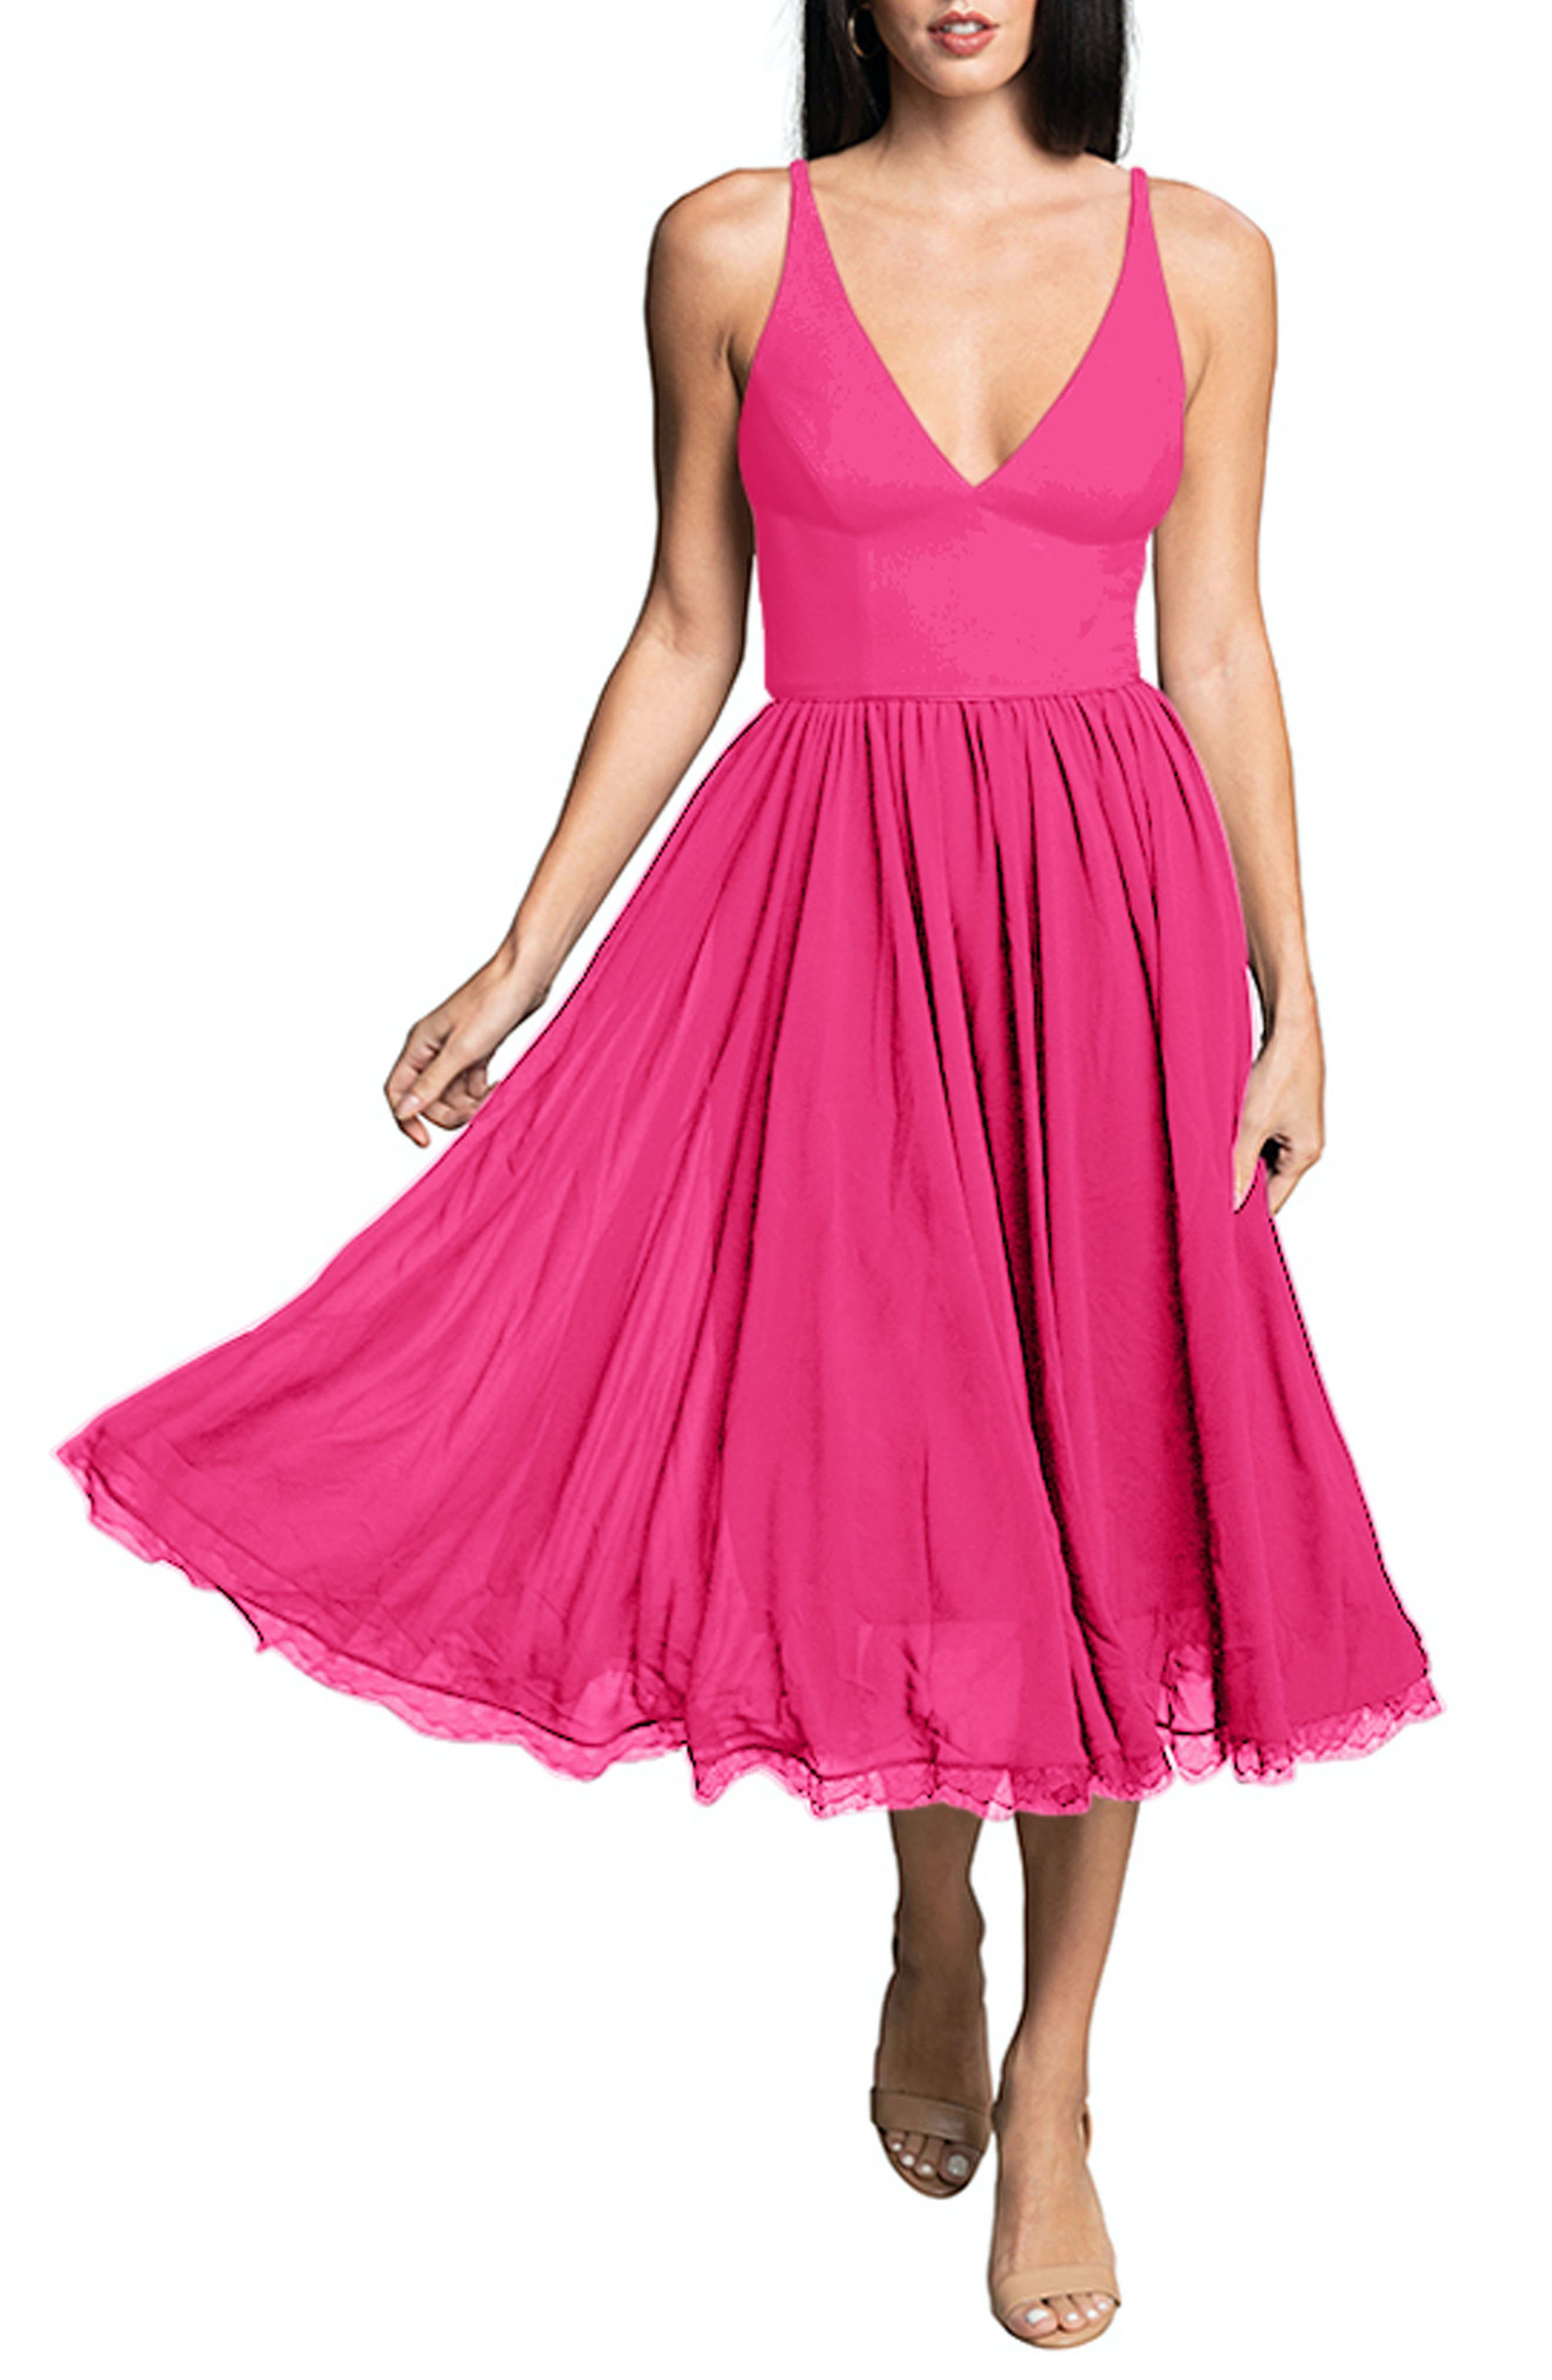 homecoming dresses,homecoming dresses,homecoming dresses,homecoming dresses,Homecoming Dresses,